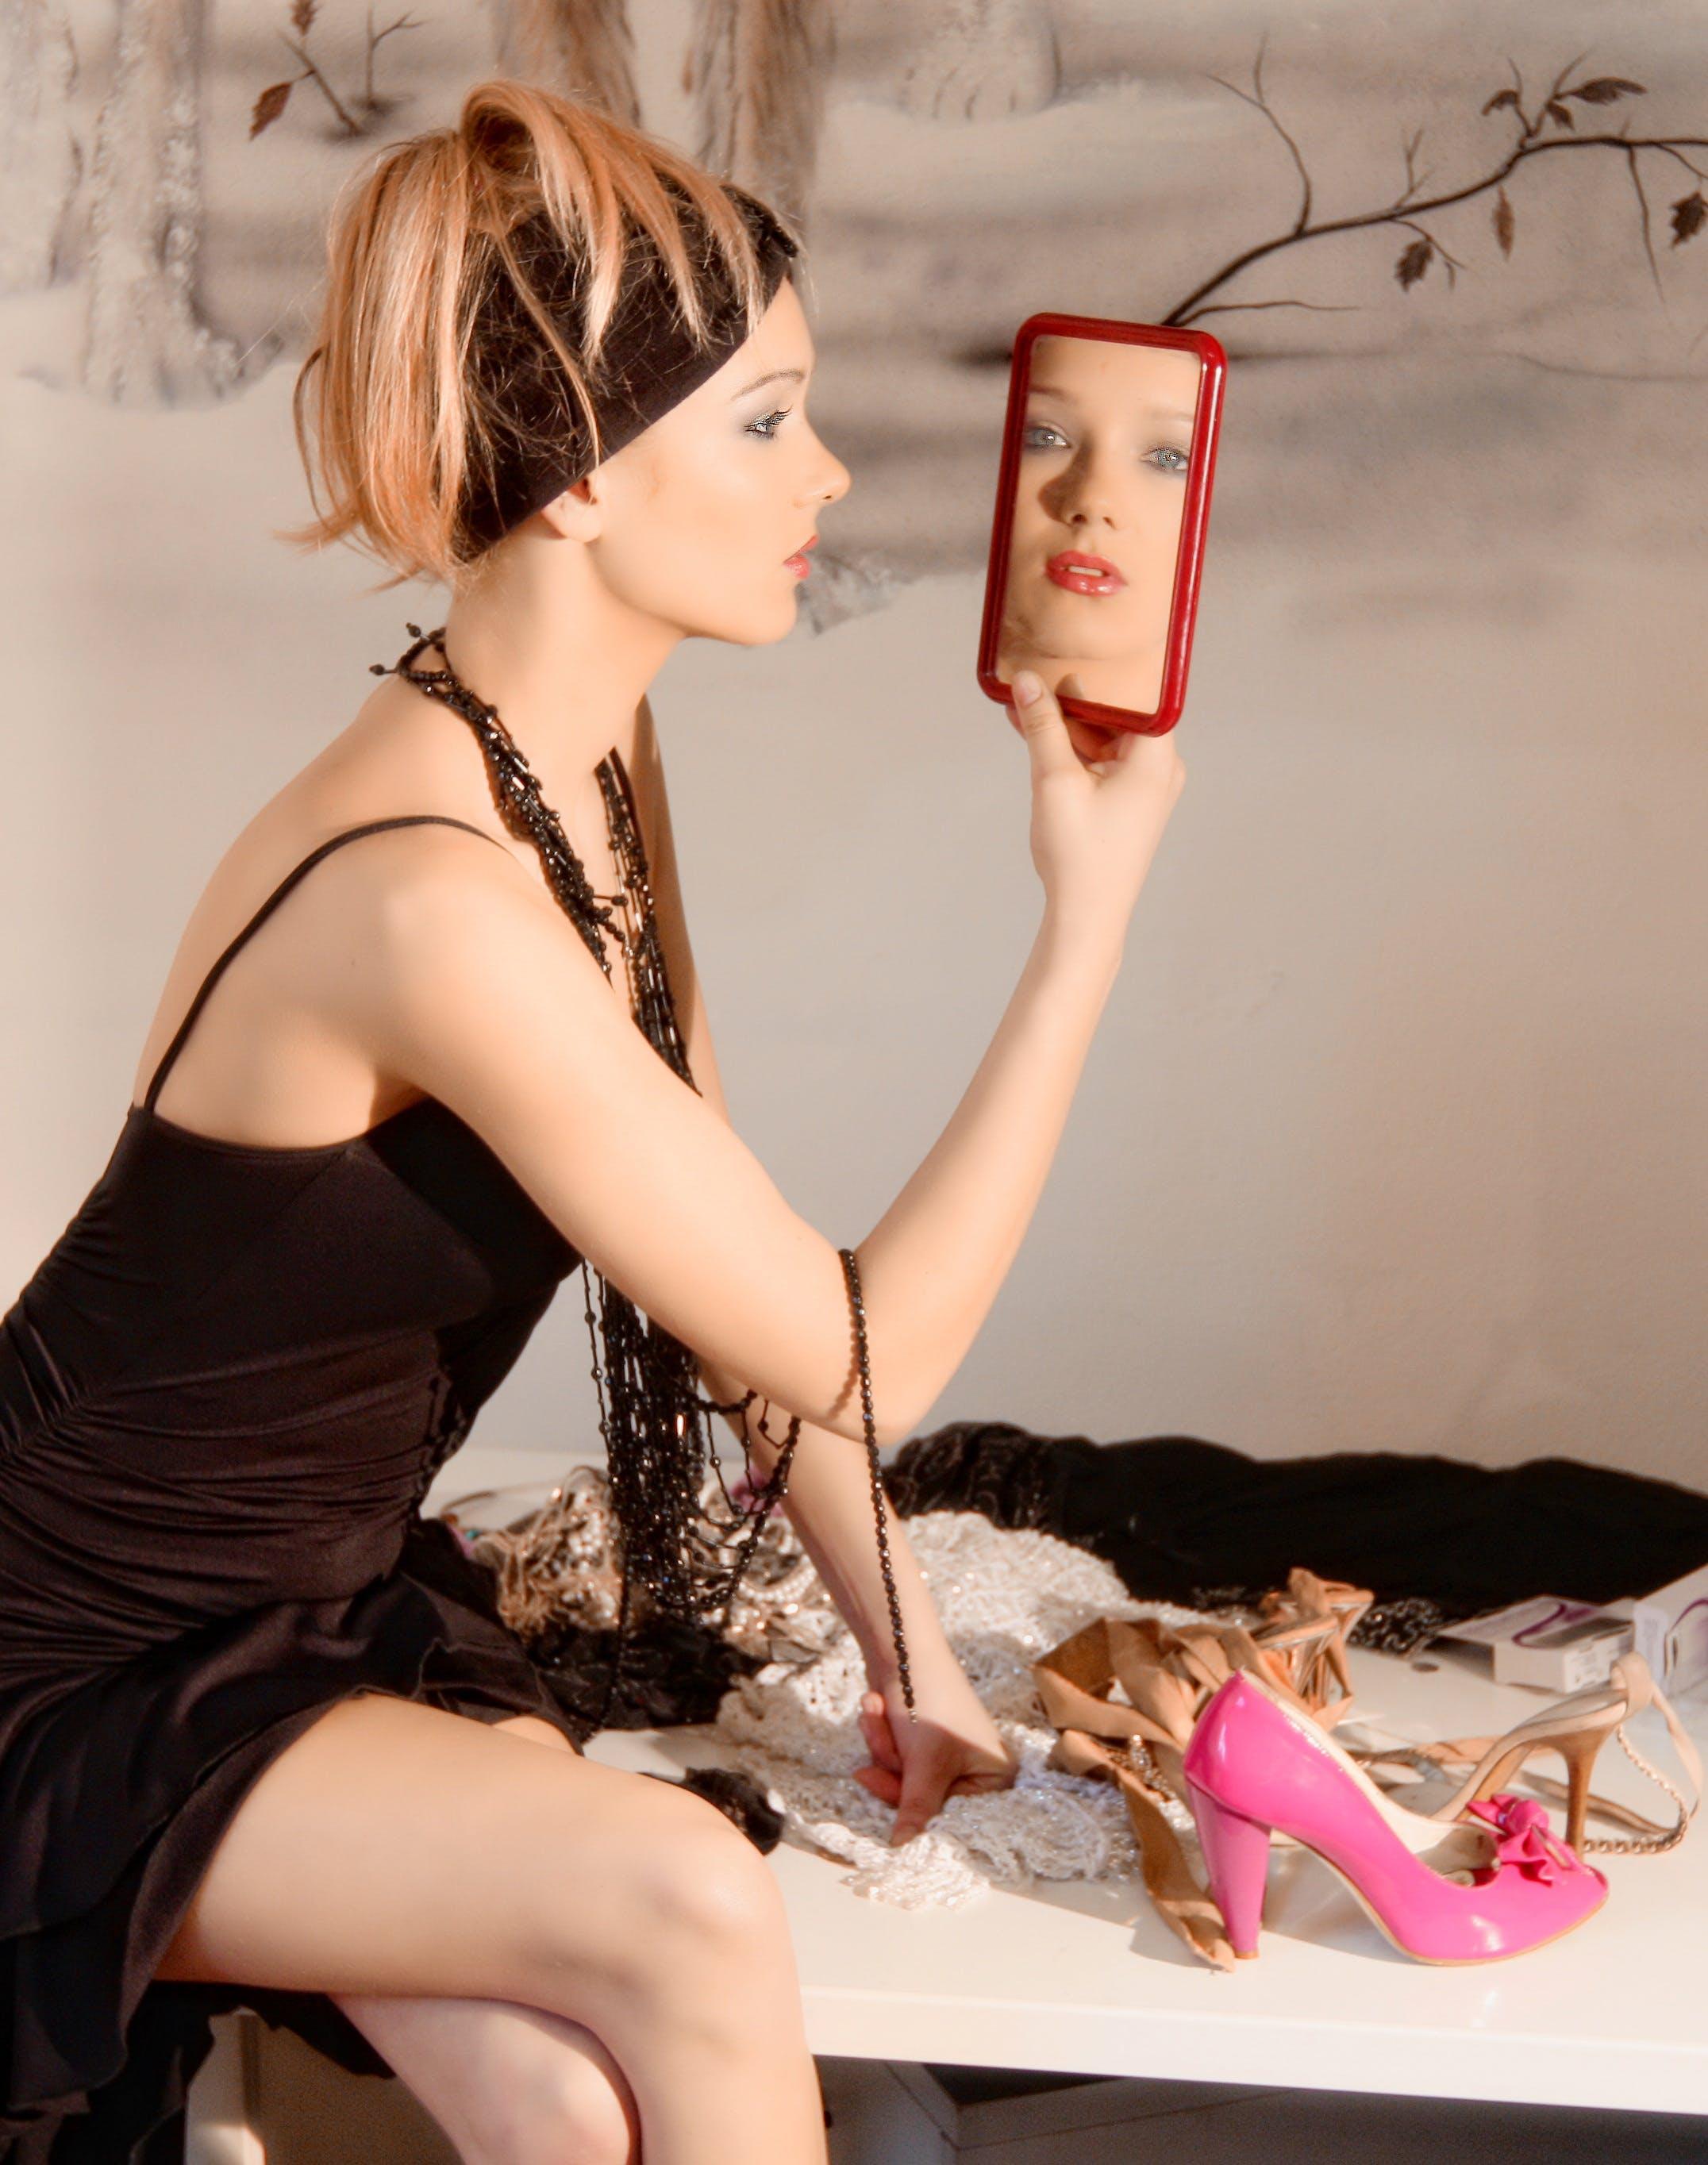 Free stock photo of fashion, woman, girl, blonde